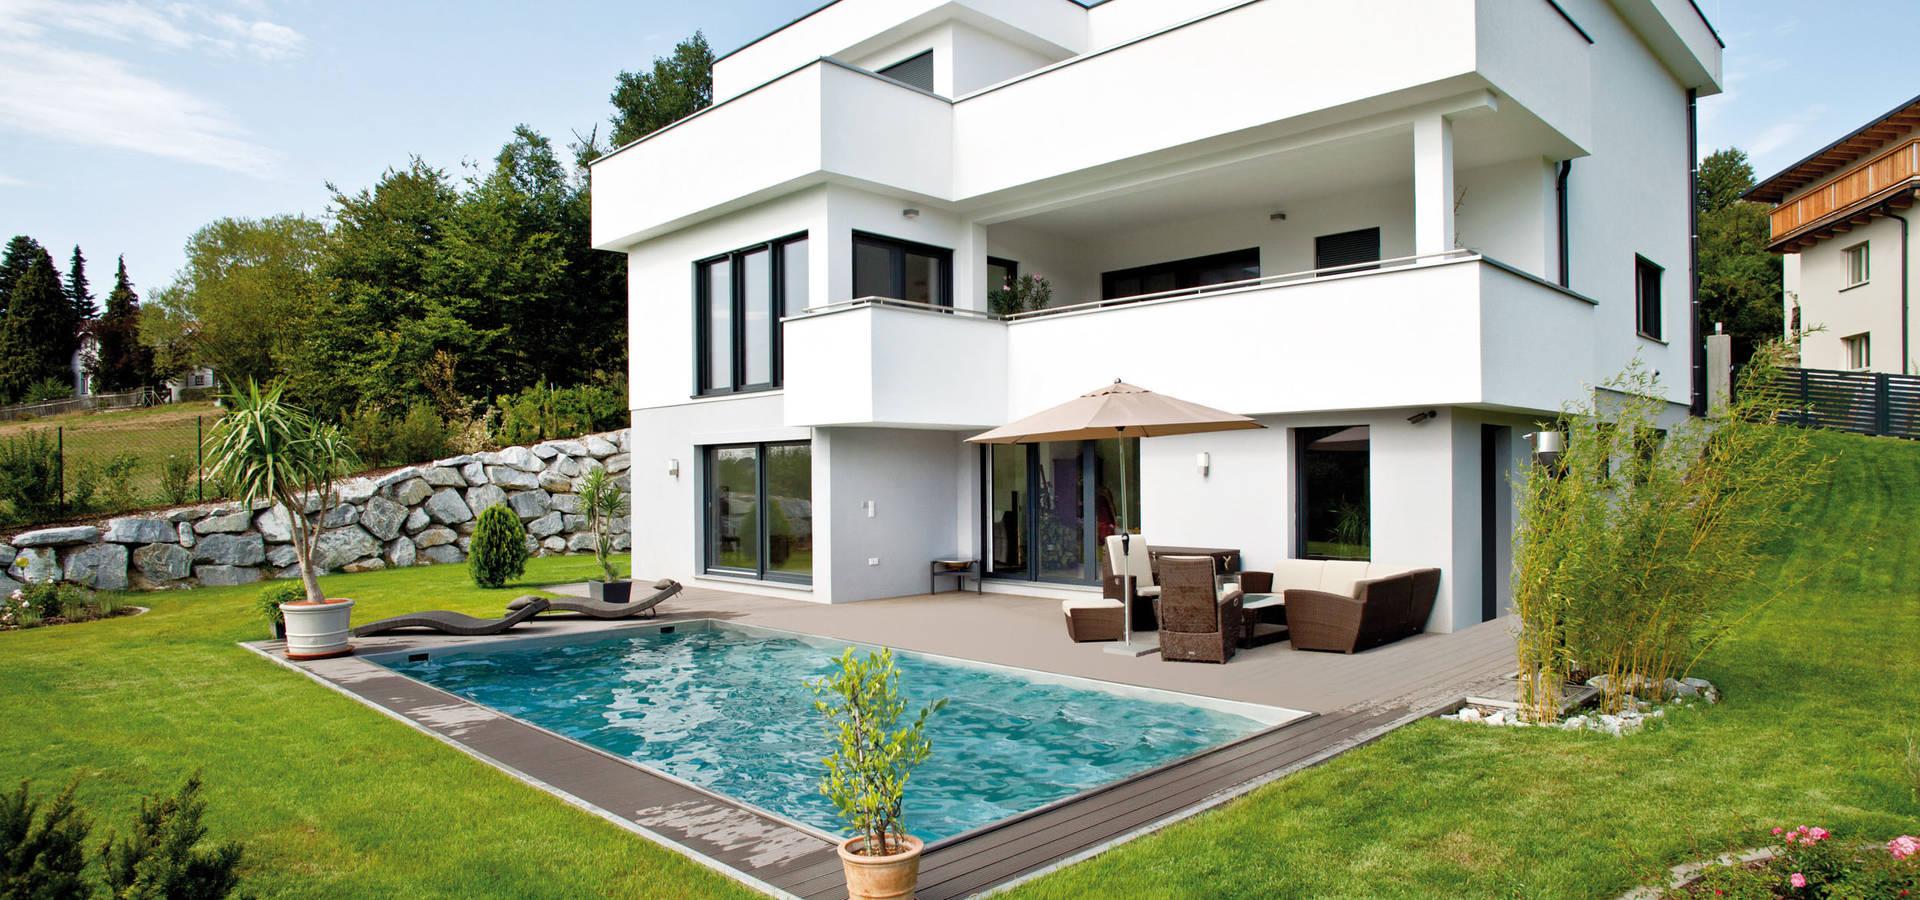 Fertighaus modern fertighaus bungalow s with fertighaus for Fertighaus modern